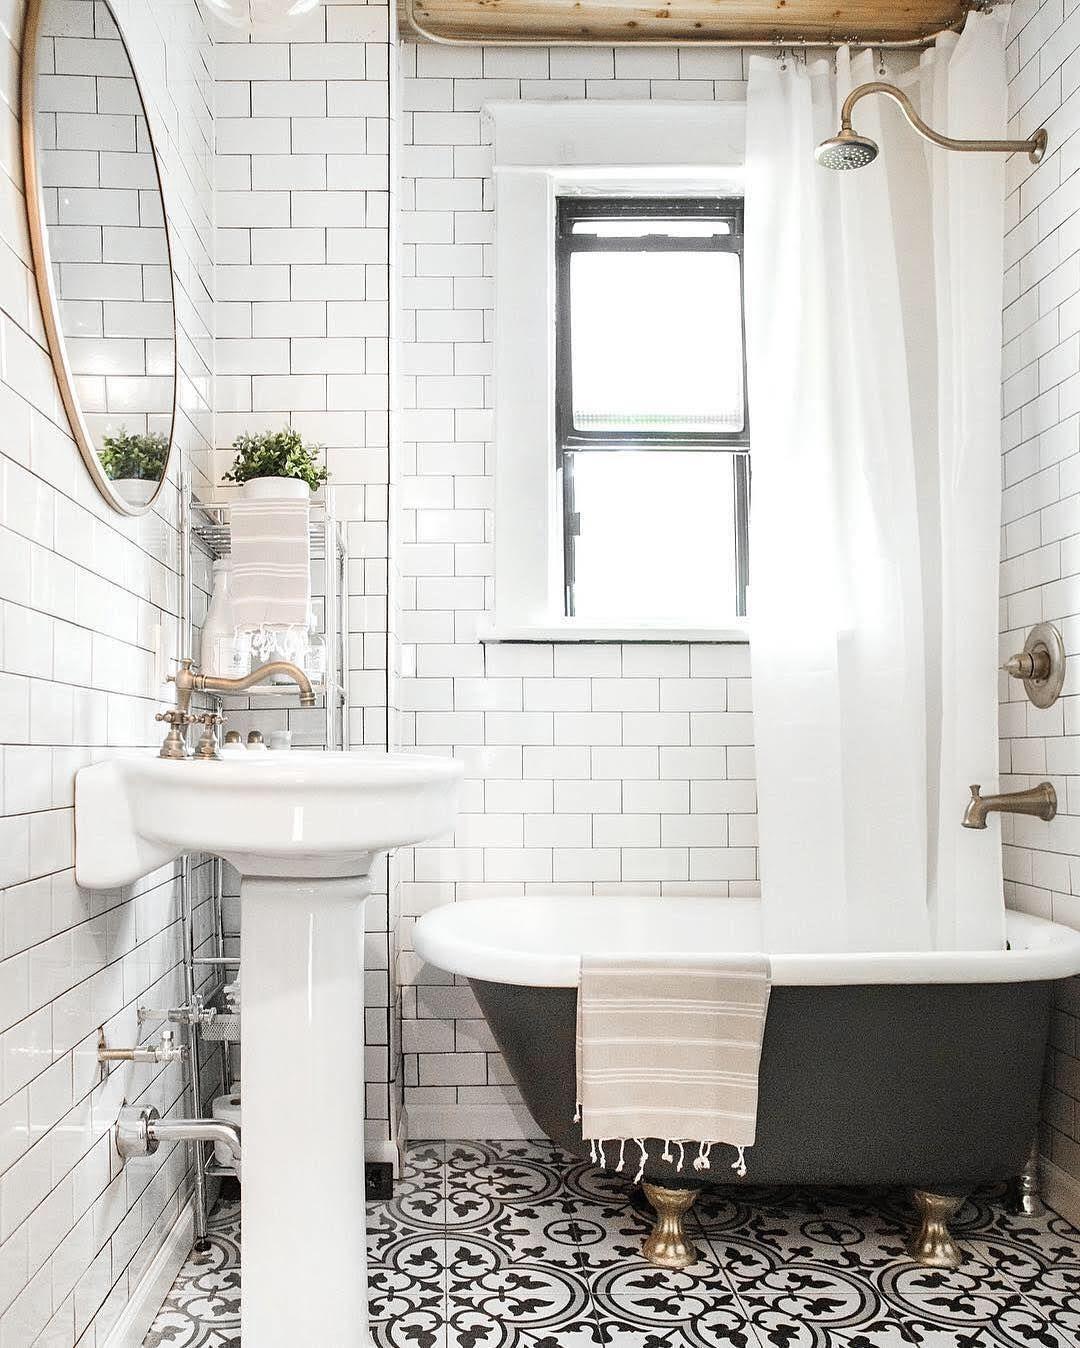 Interior Envy 22 Clawfoot Tubs We Love Gorgeous Bathroom Black